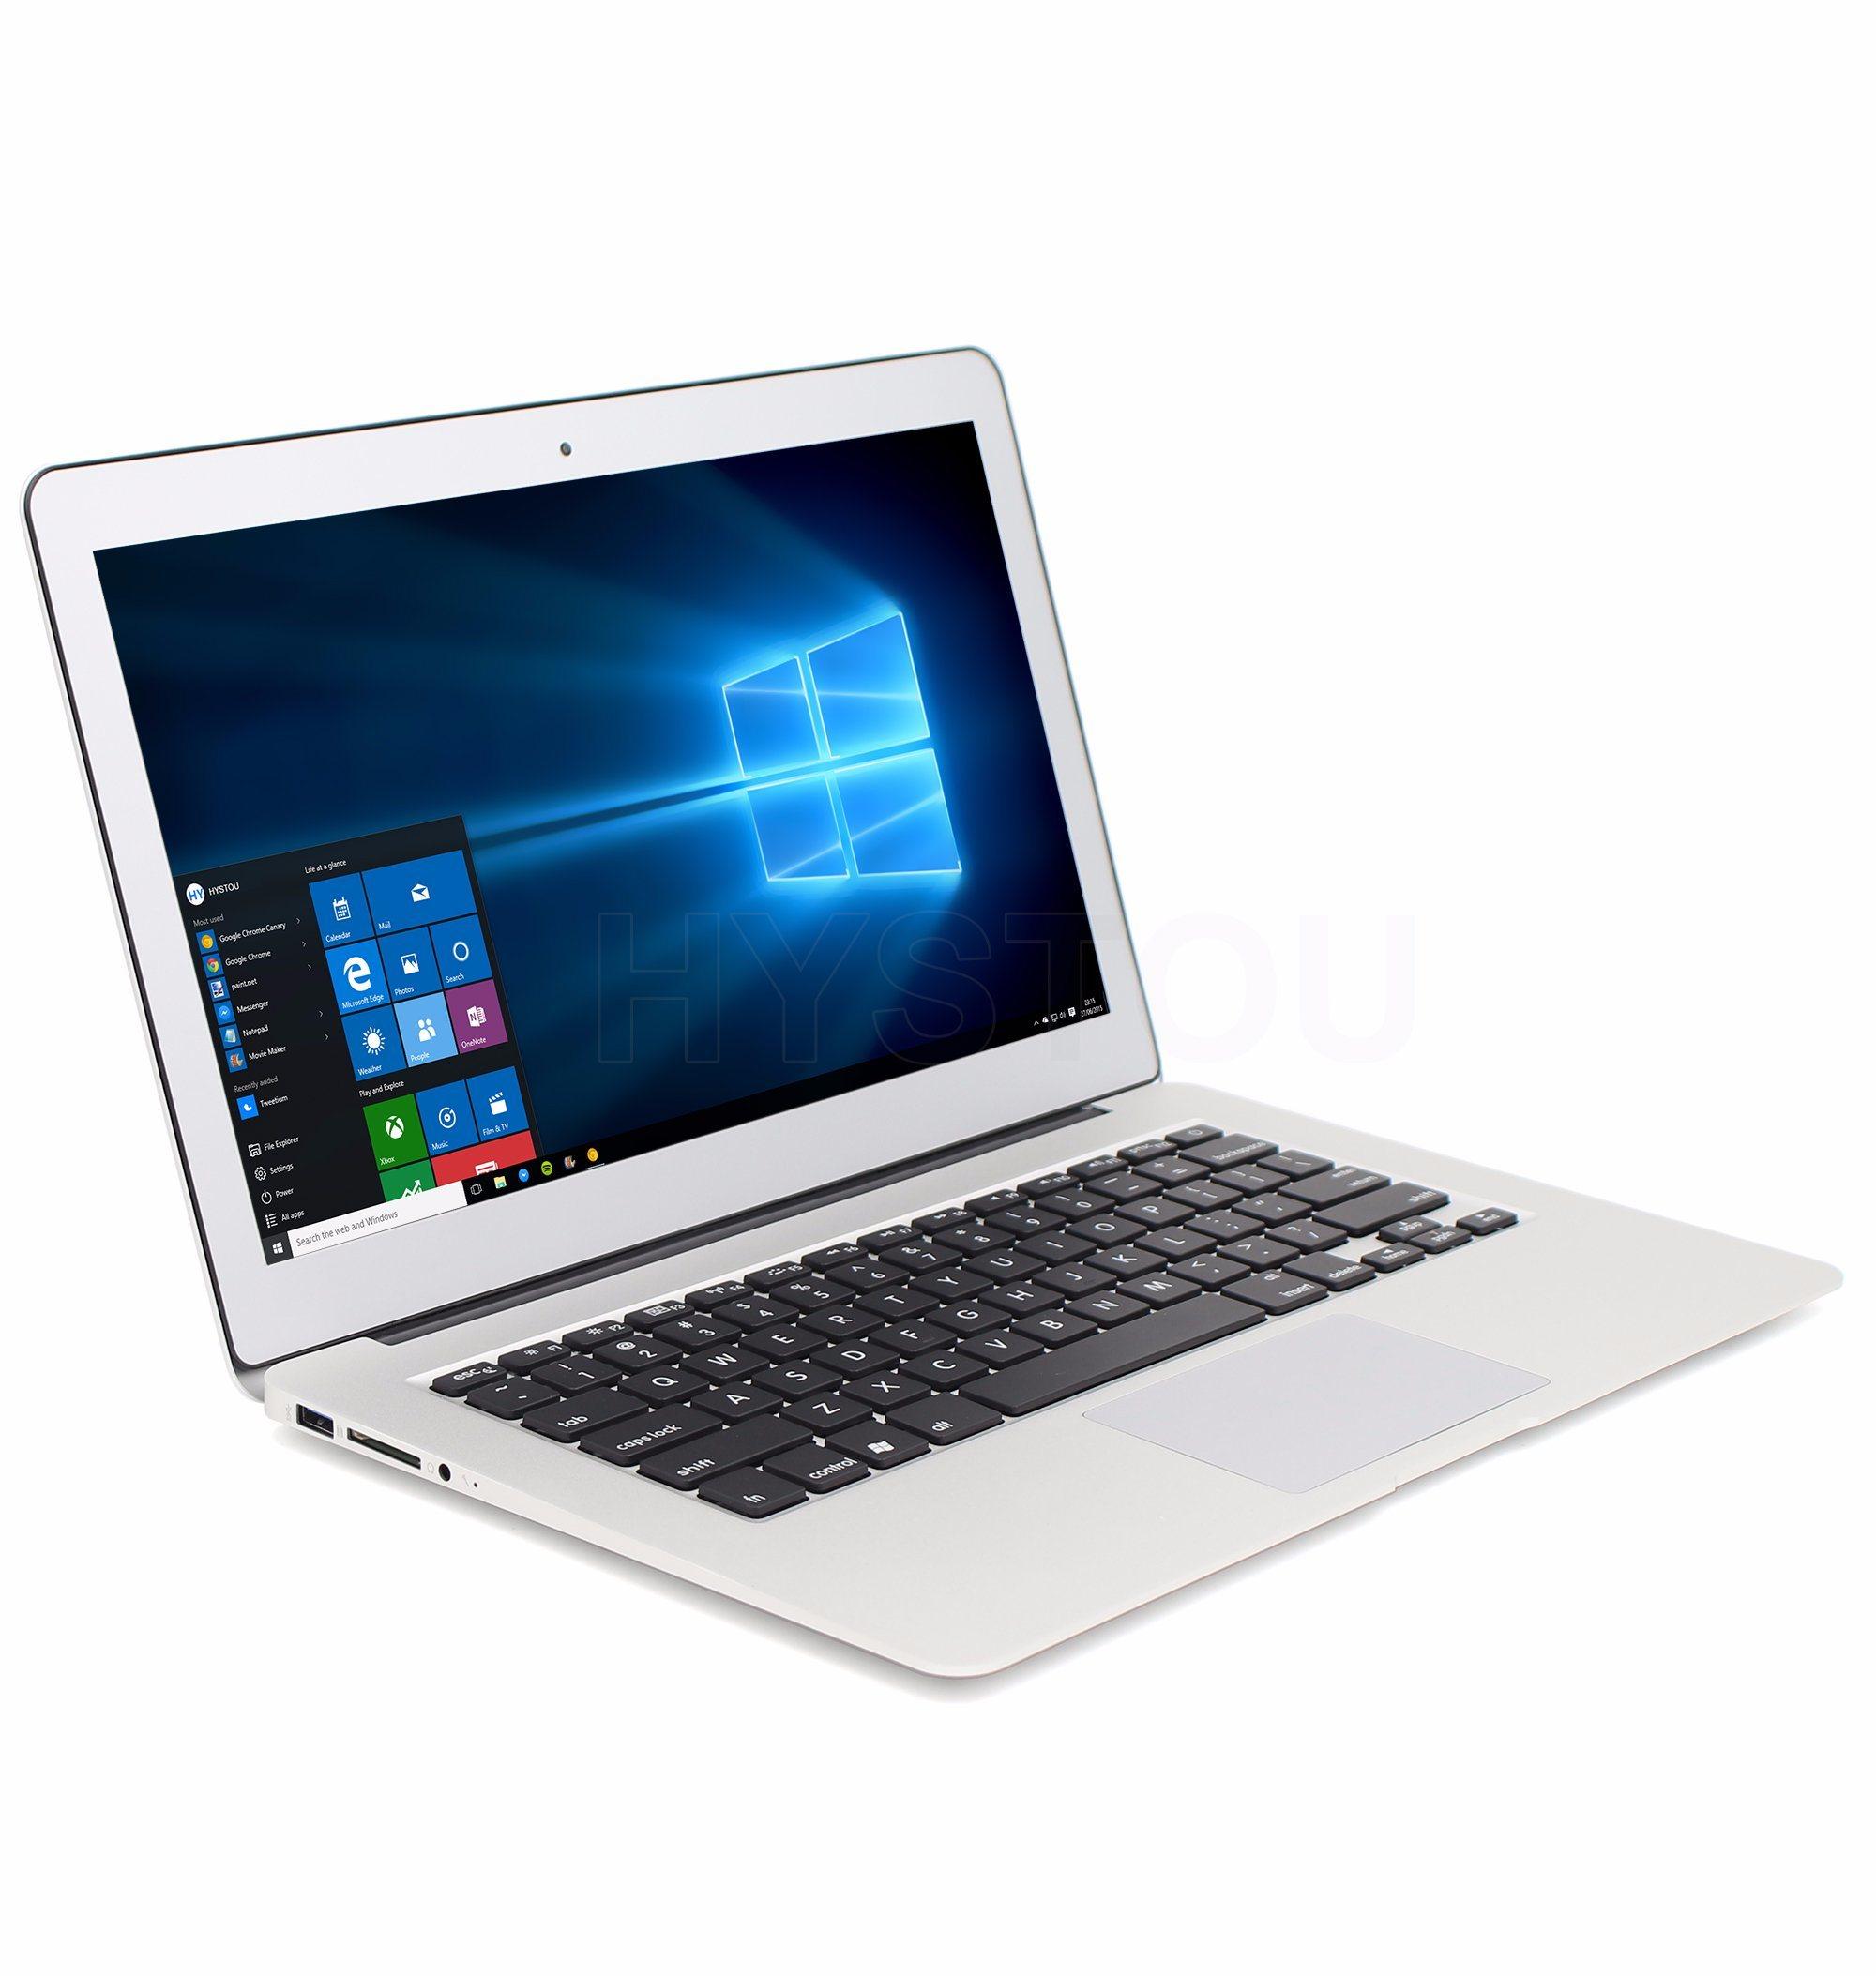 Intel Core I5 5200u Mini Laptop Computer (fanless and silver)